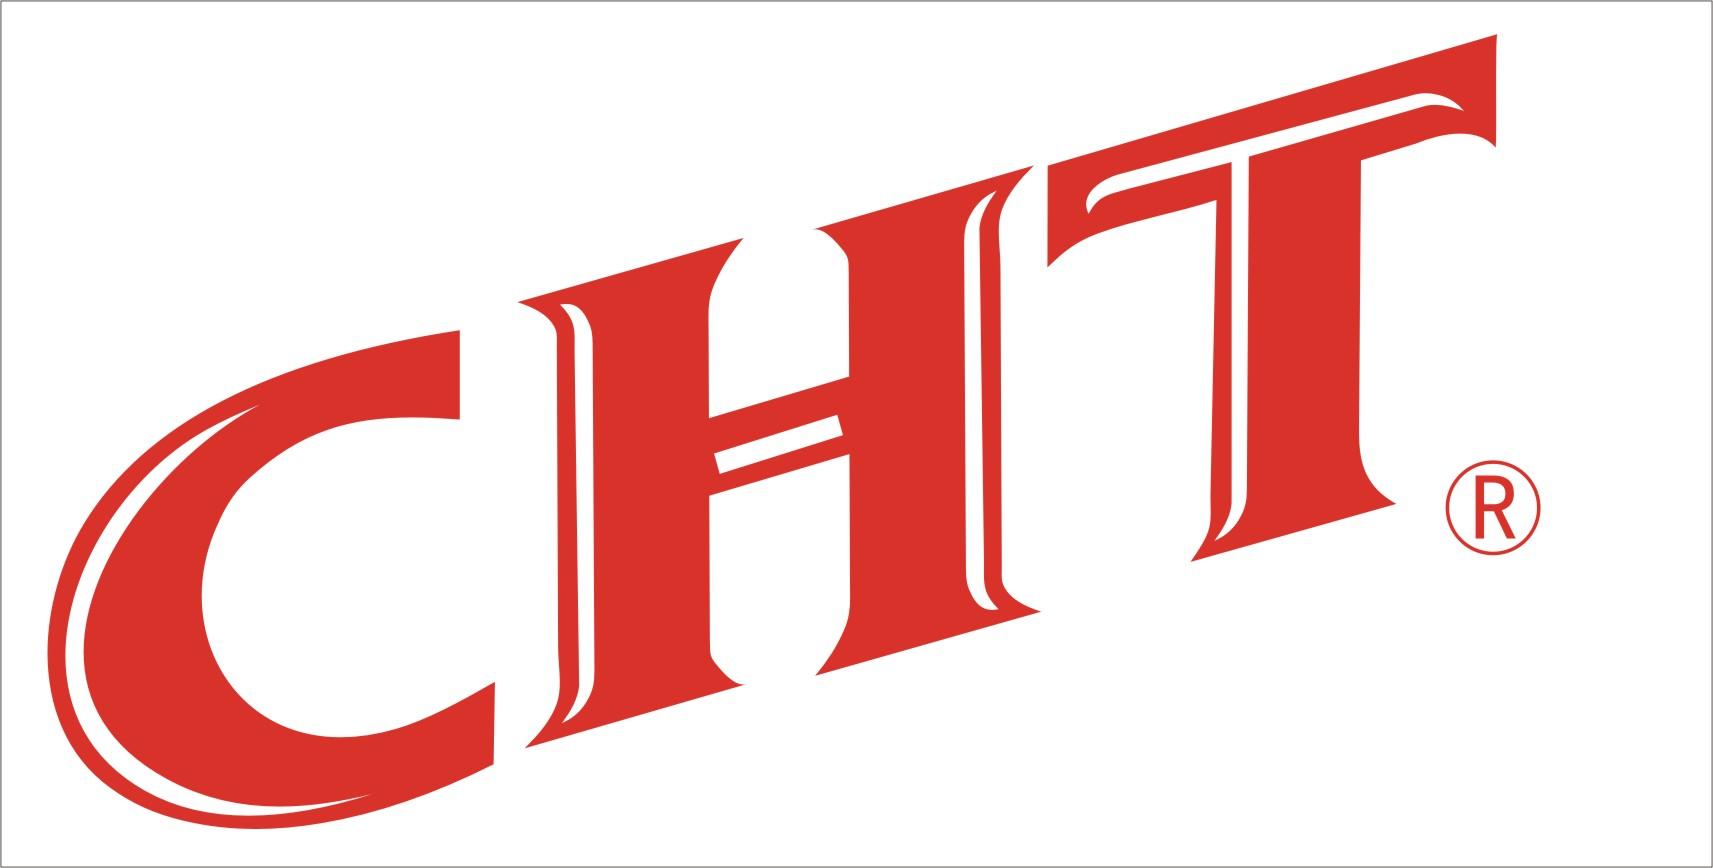 Shenzhen Cht Electronics Co. Ltd